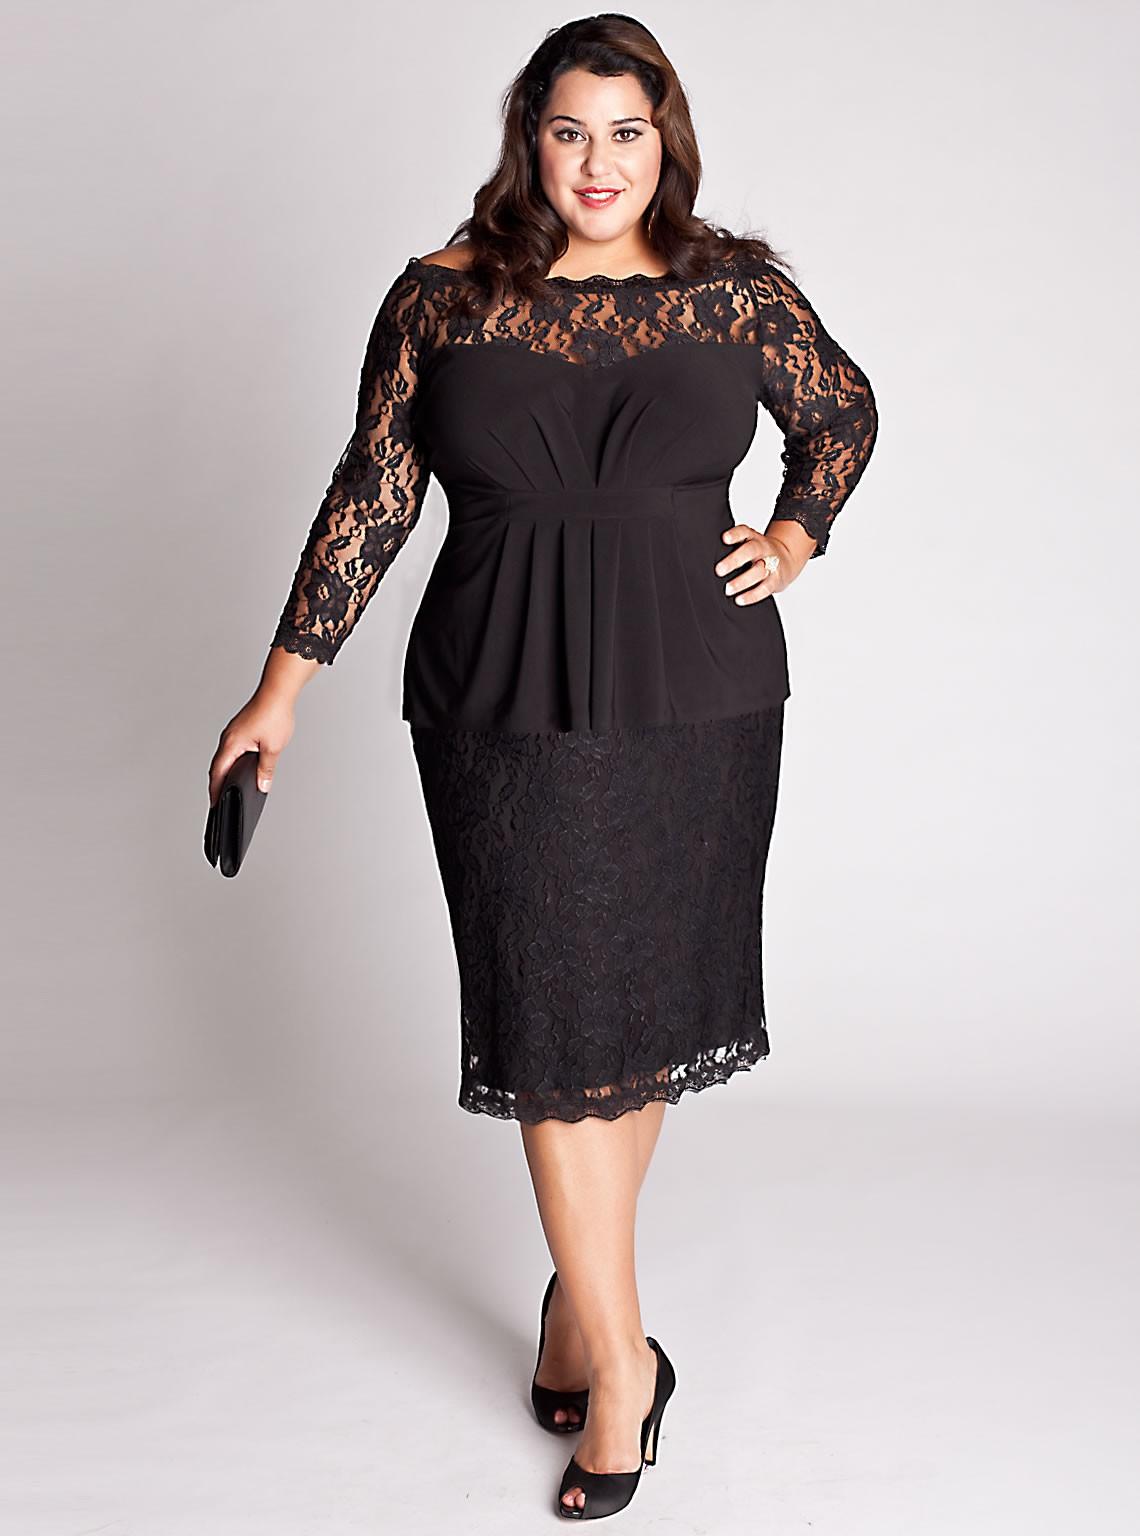 Dresses for plus size women emejing plus size clothing dresses ideas plus size clothing MSIKTZA